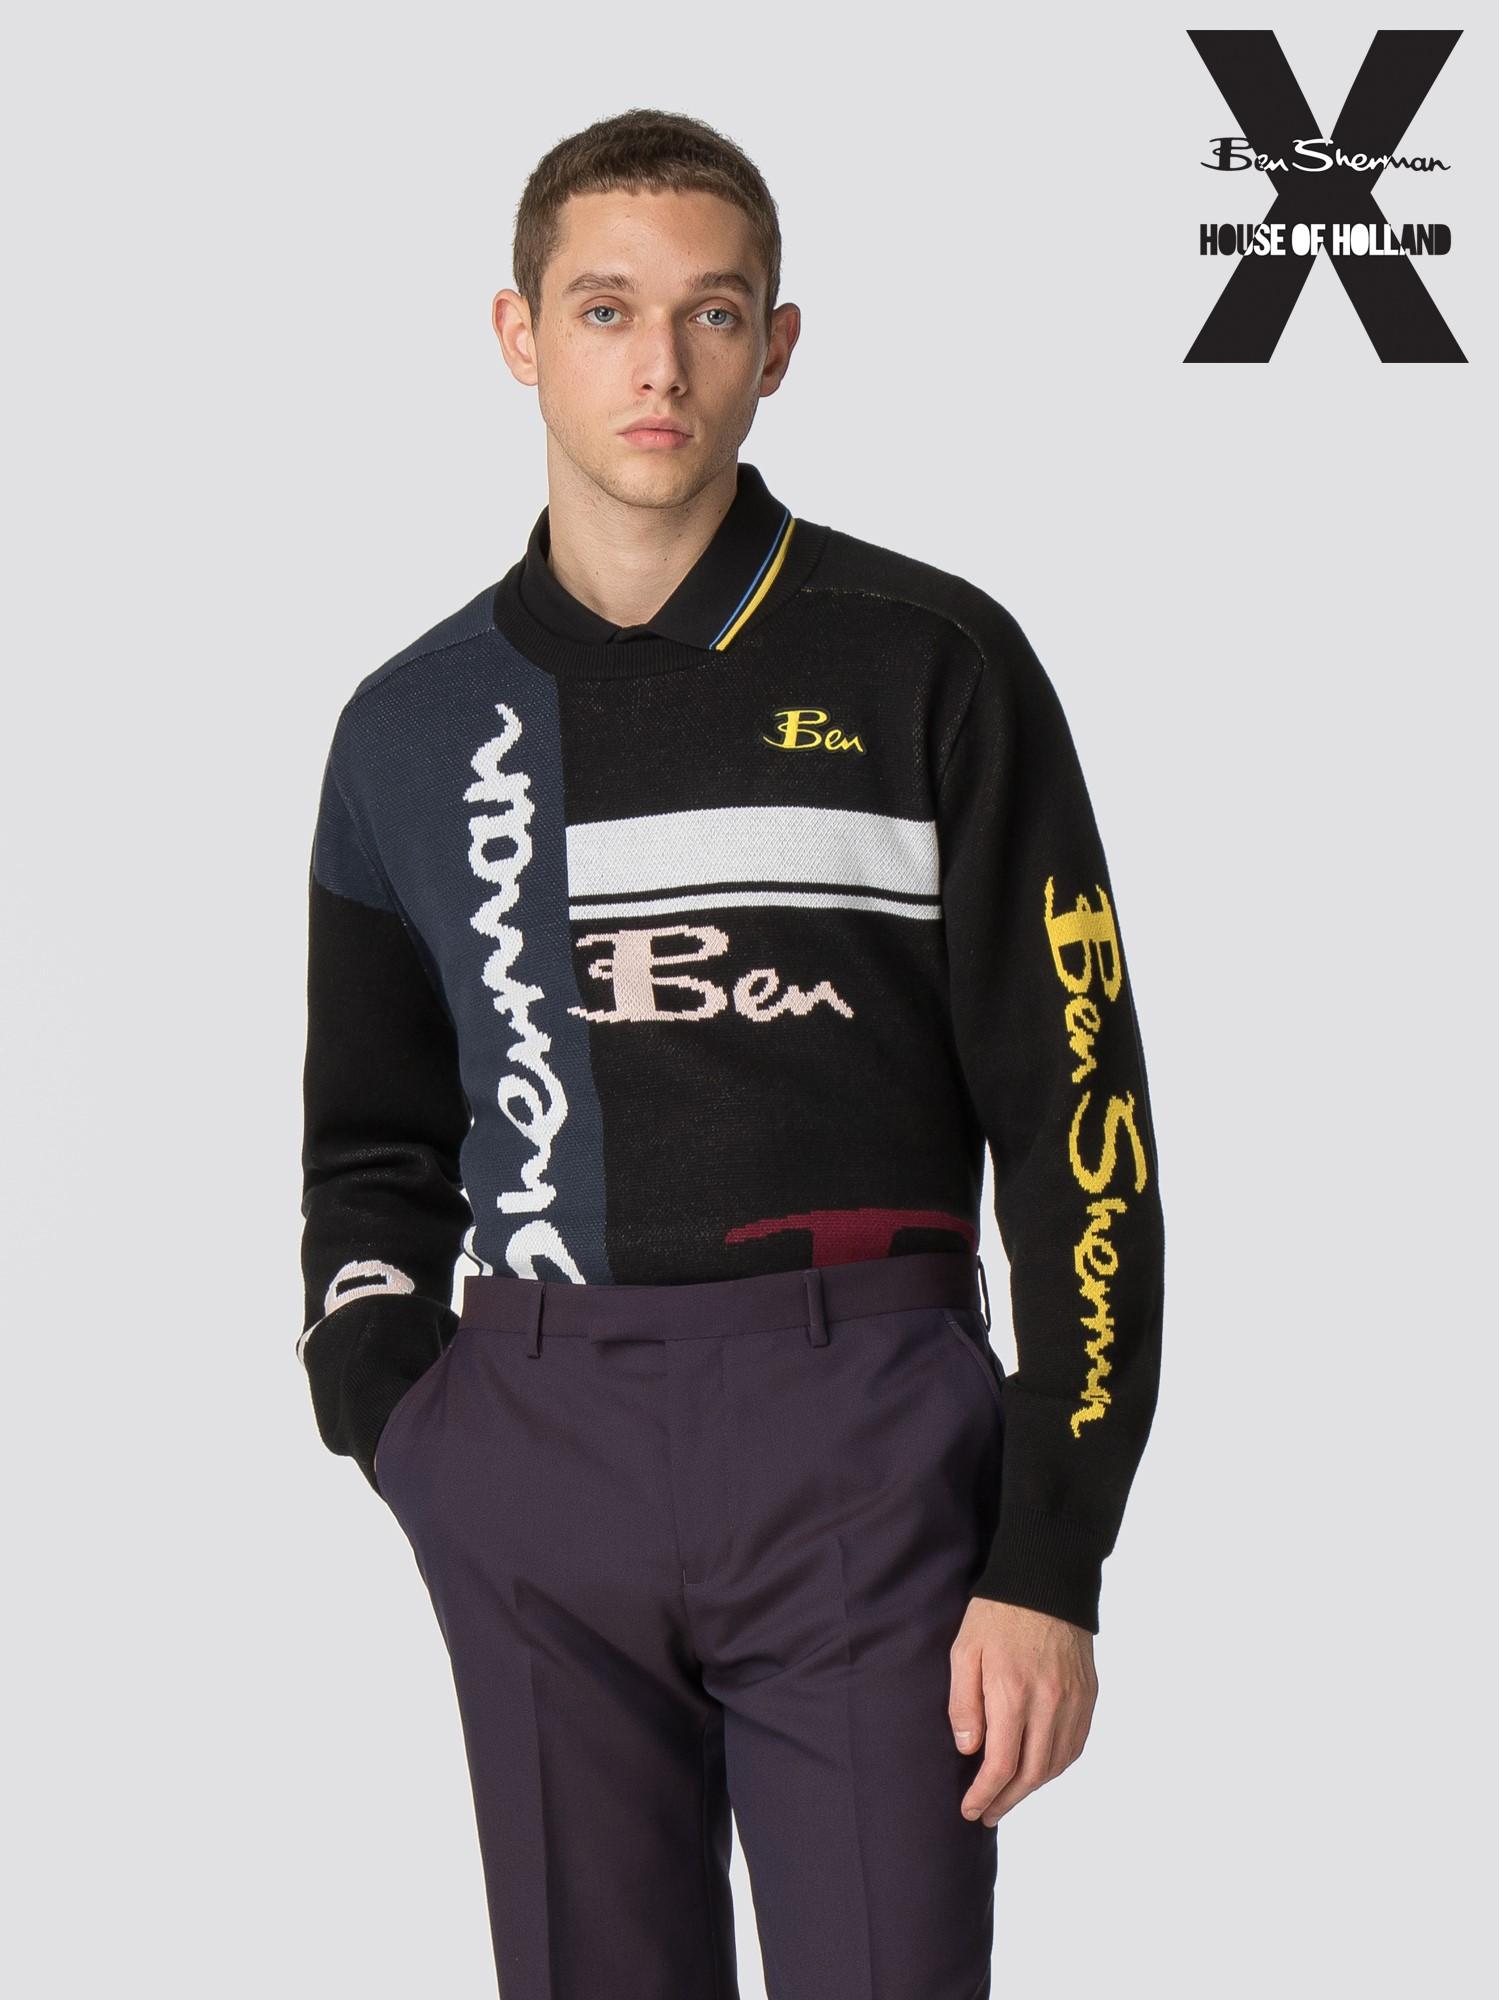 99515787e3d Men's Logo Knitted Crew Jumper | Ben Sherman x House of Holland